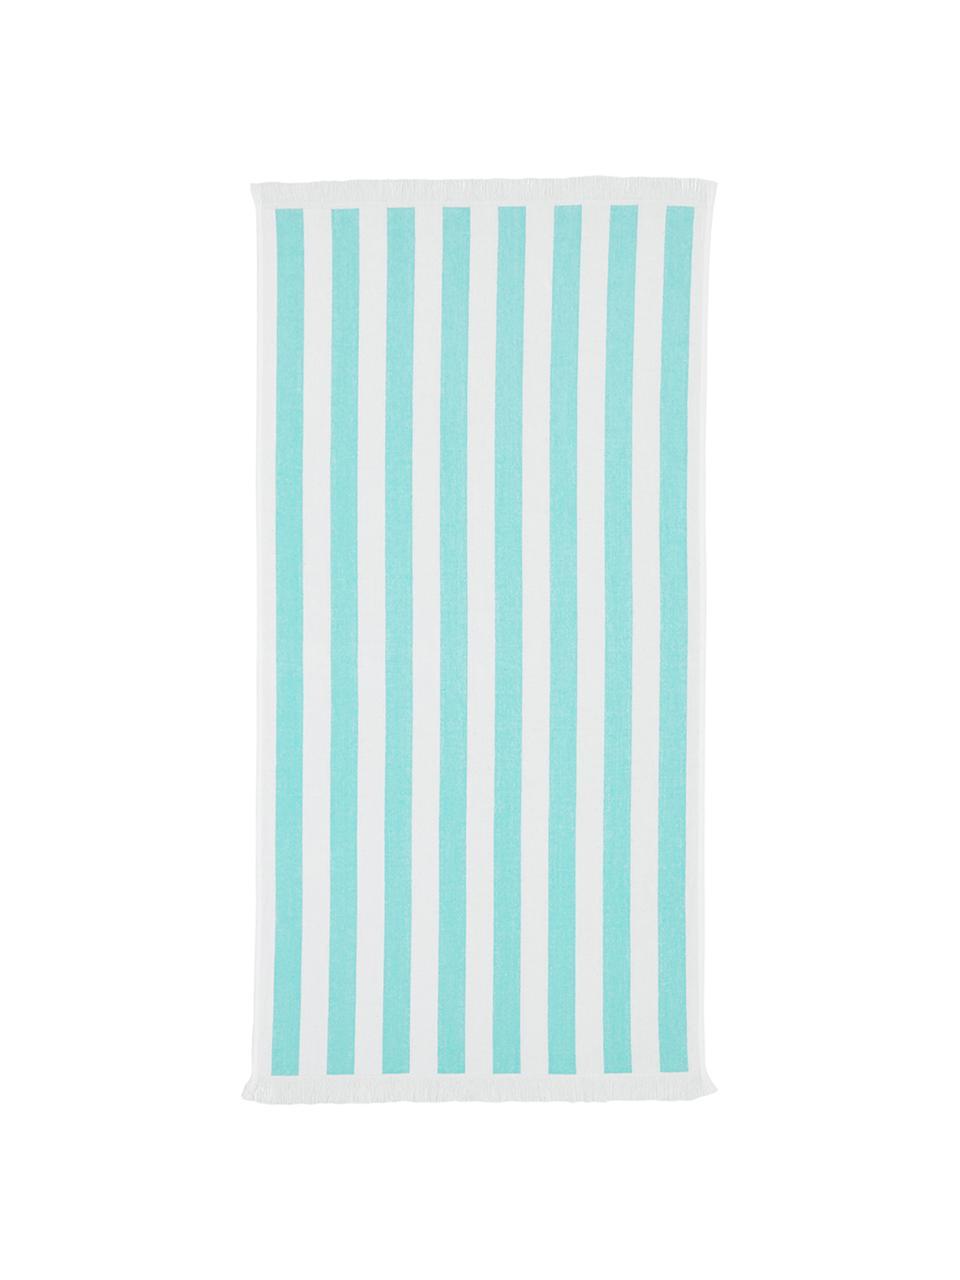 Ręcznik plażowy Mare, 100% bawełna Niska gramatura 380 g/m², Turkusowy, biały, S 80 x D 160 cm